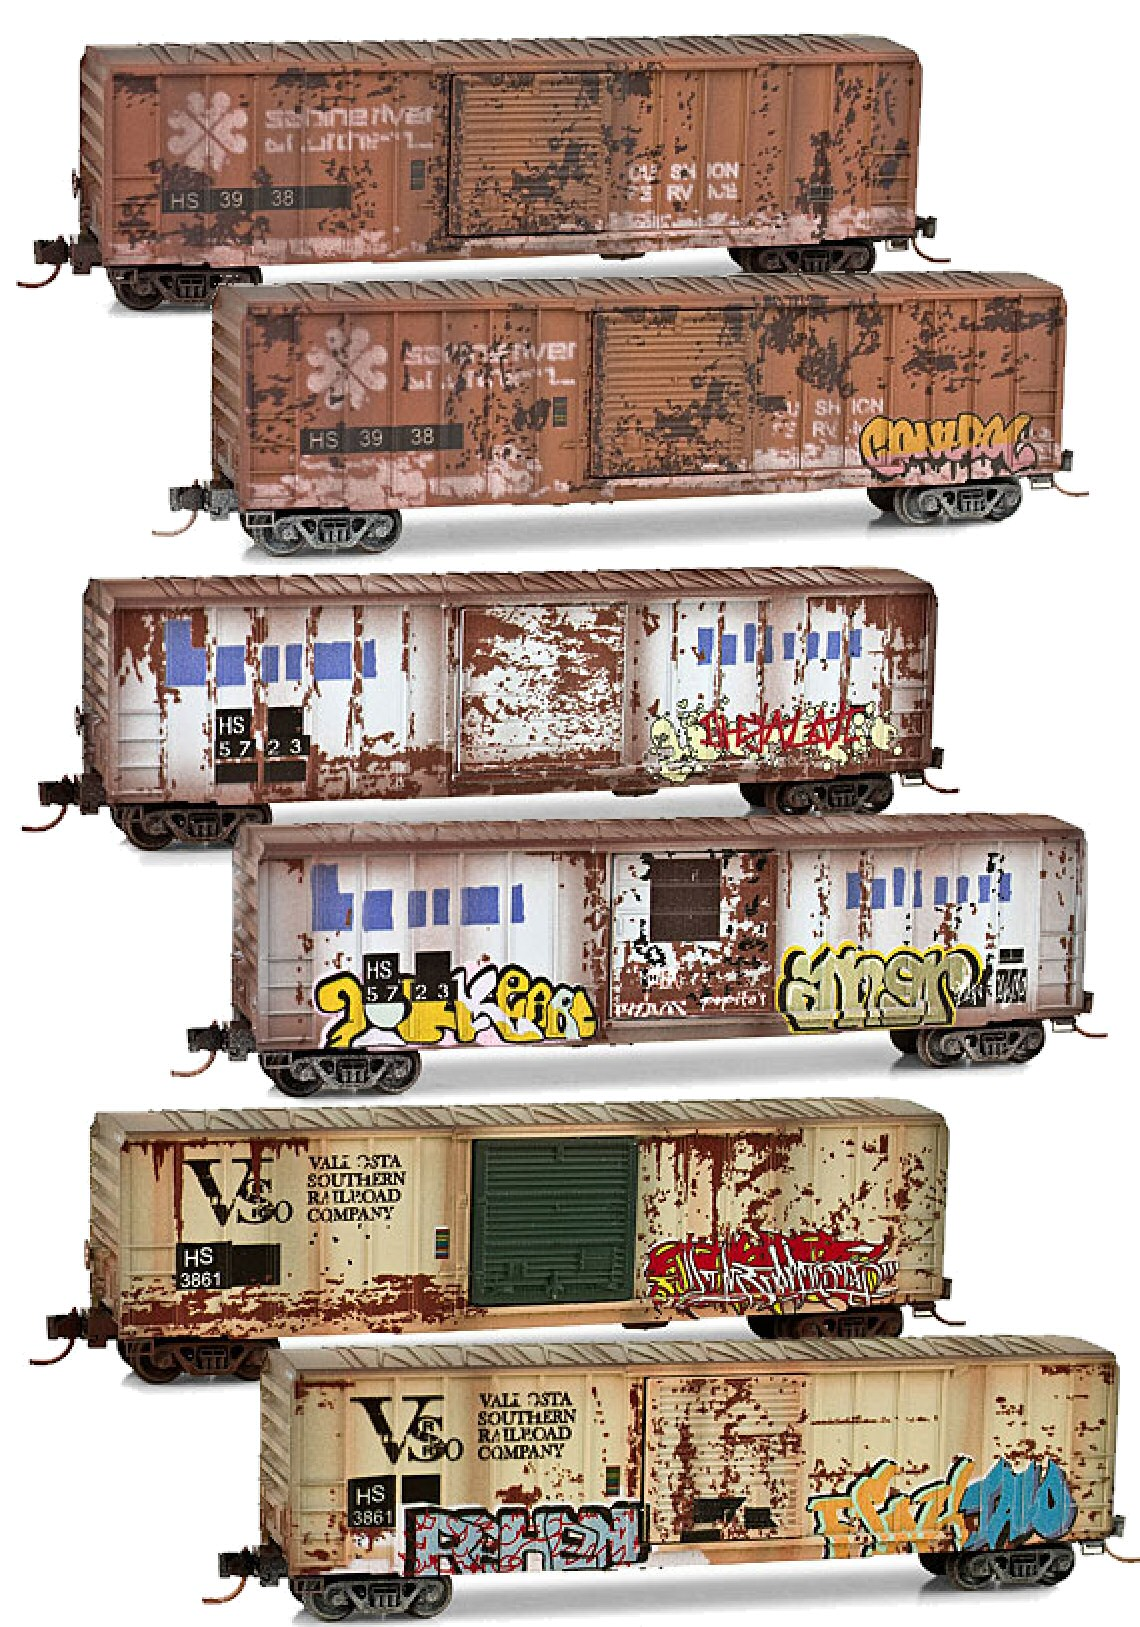 N Scale - Micro-Trains - 993 05 160 - Boxed Set, Runner Pack - Hartford & Slocumb